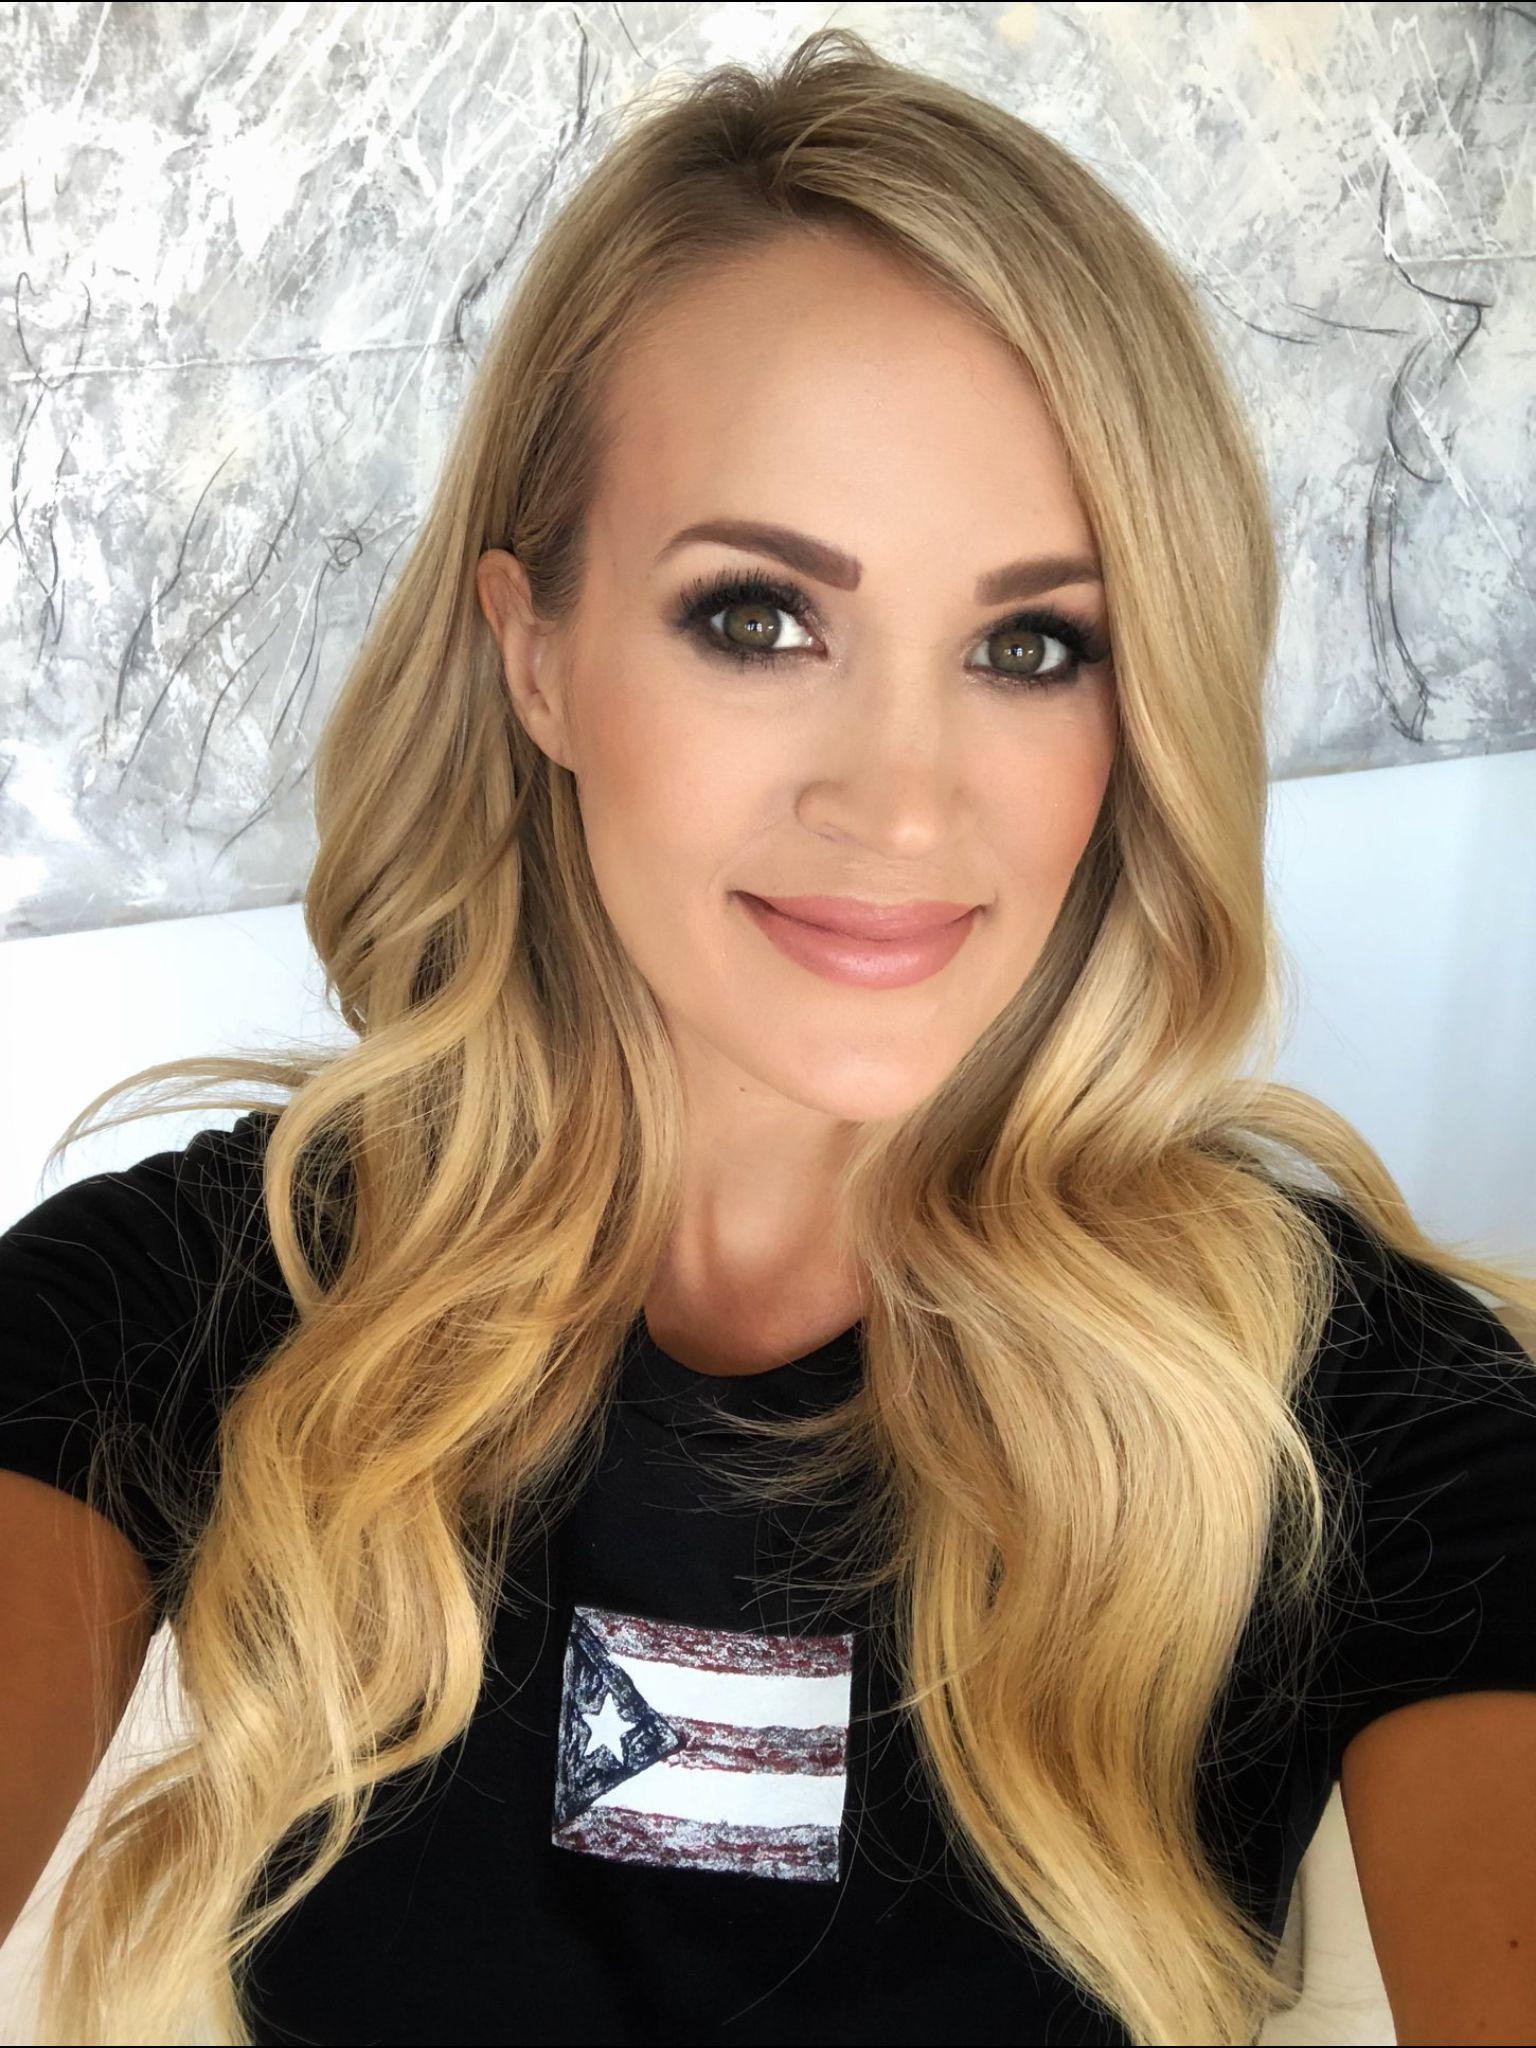 Carrie Carrie Underwood Hair Carrie Underwood Pictures Carrie